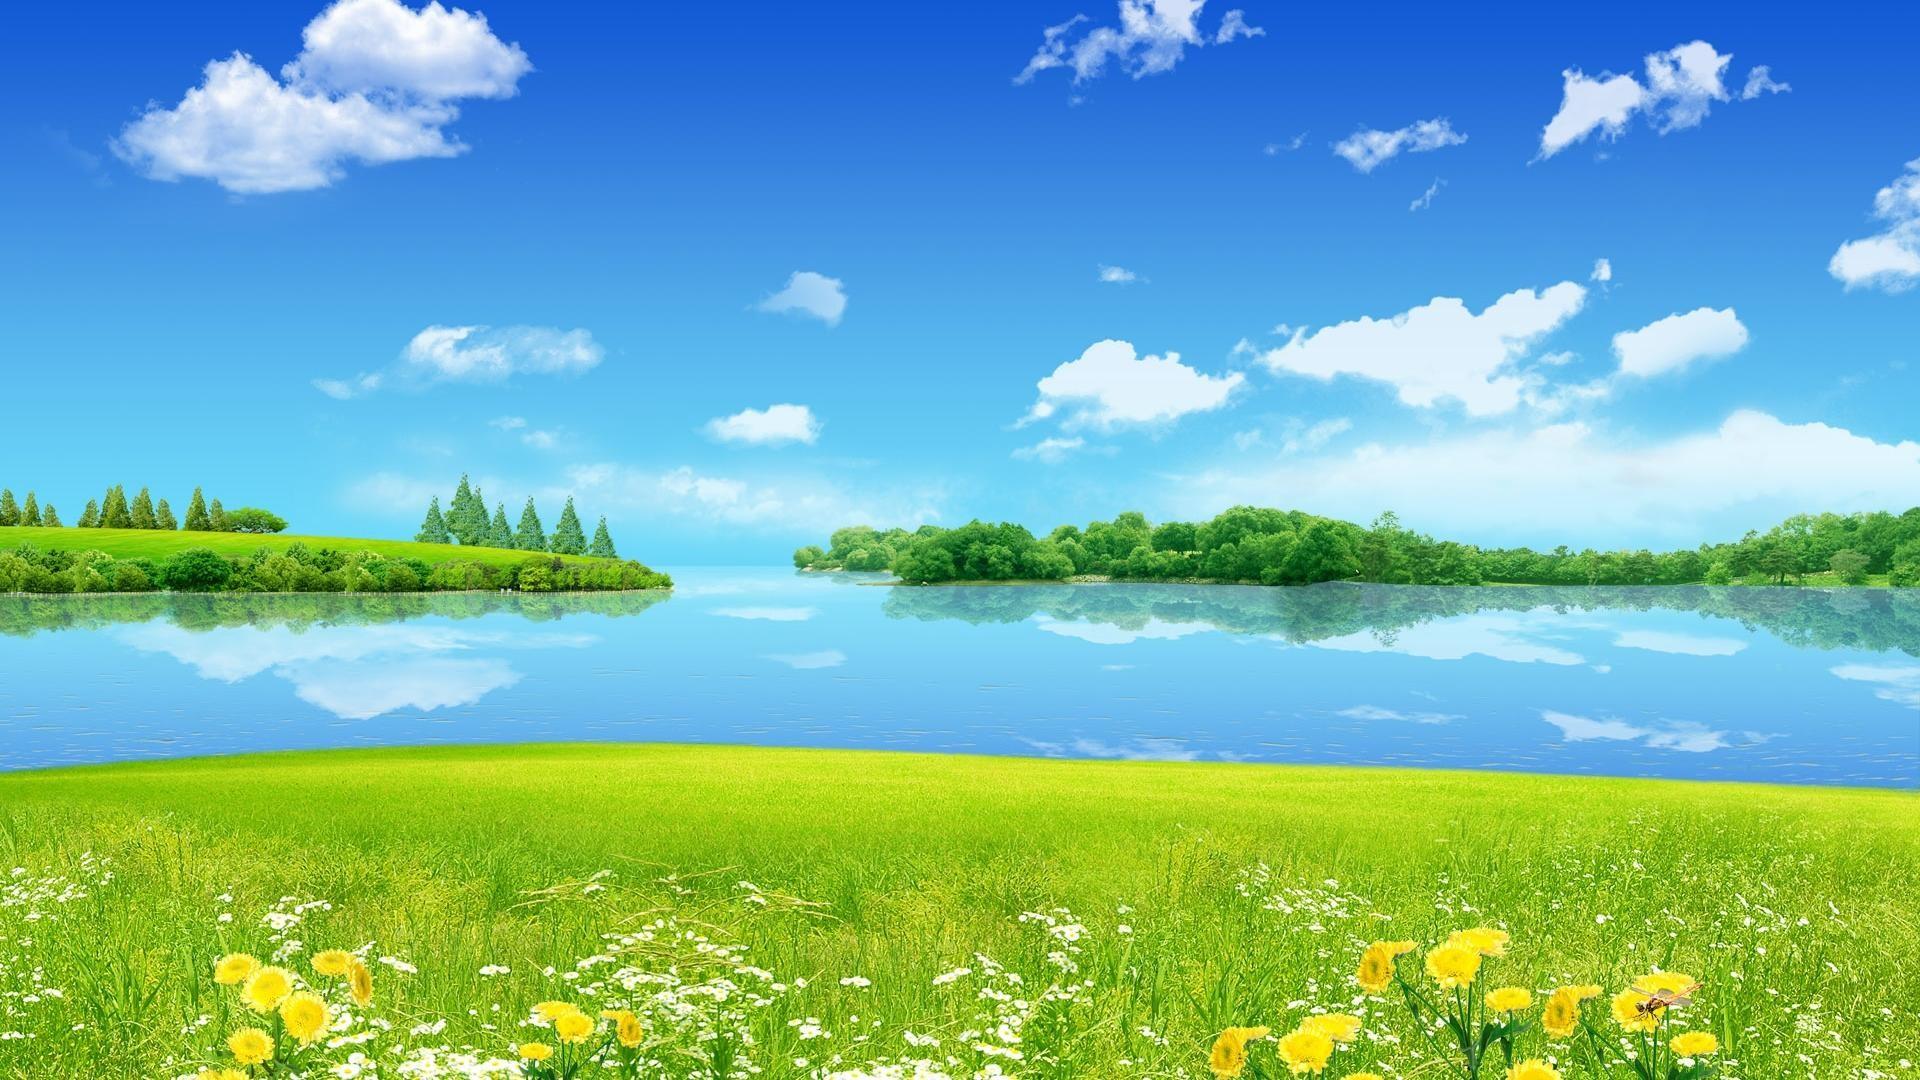 1999x1333 Country Summer Desktop Backgrounds